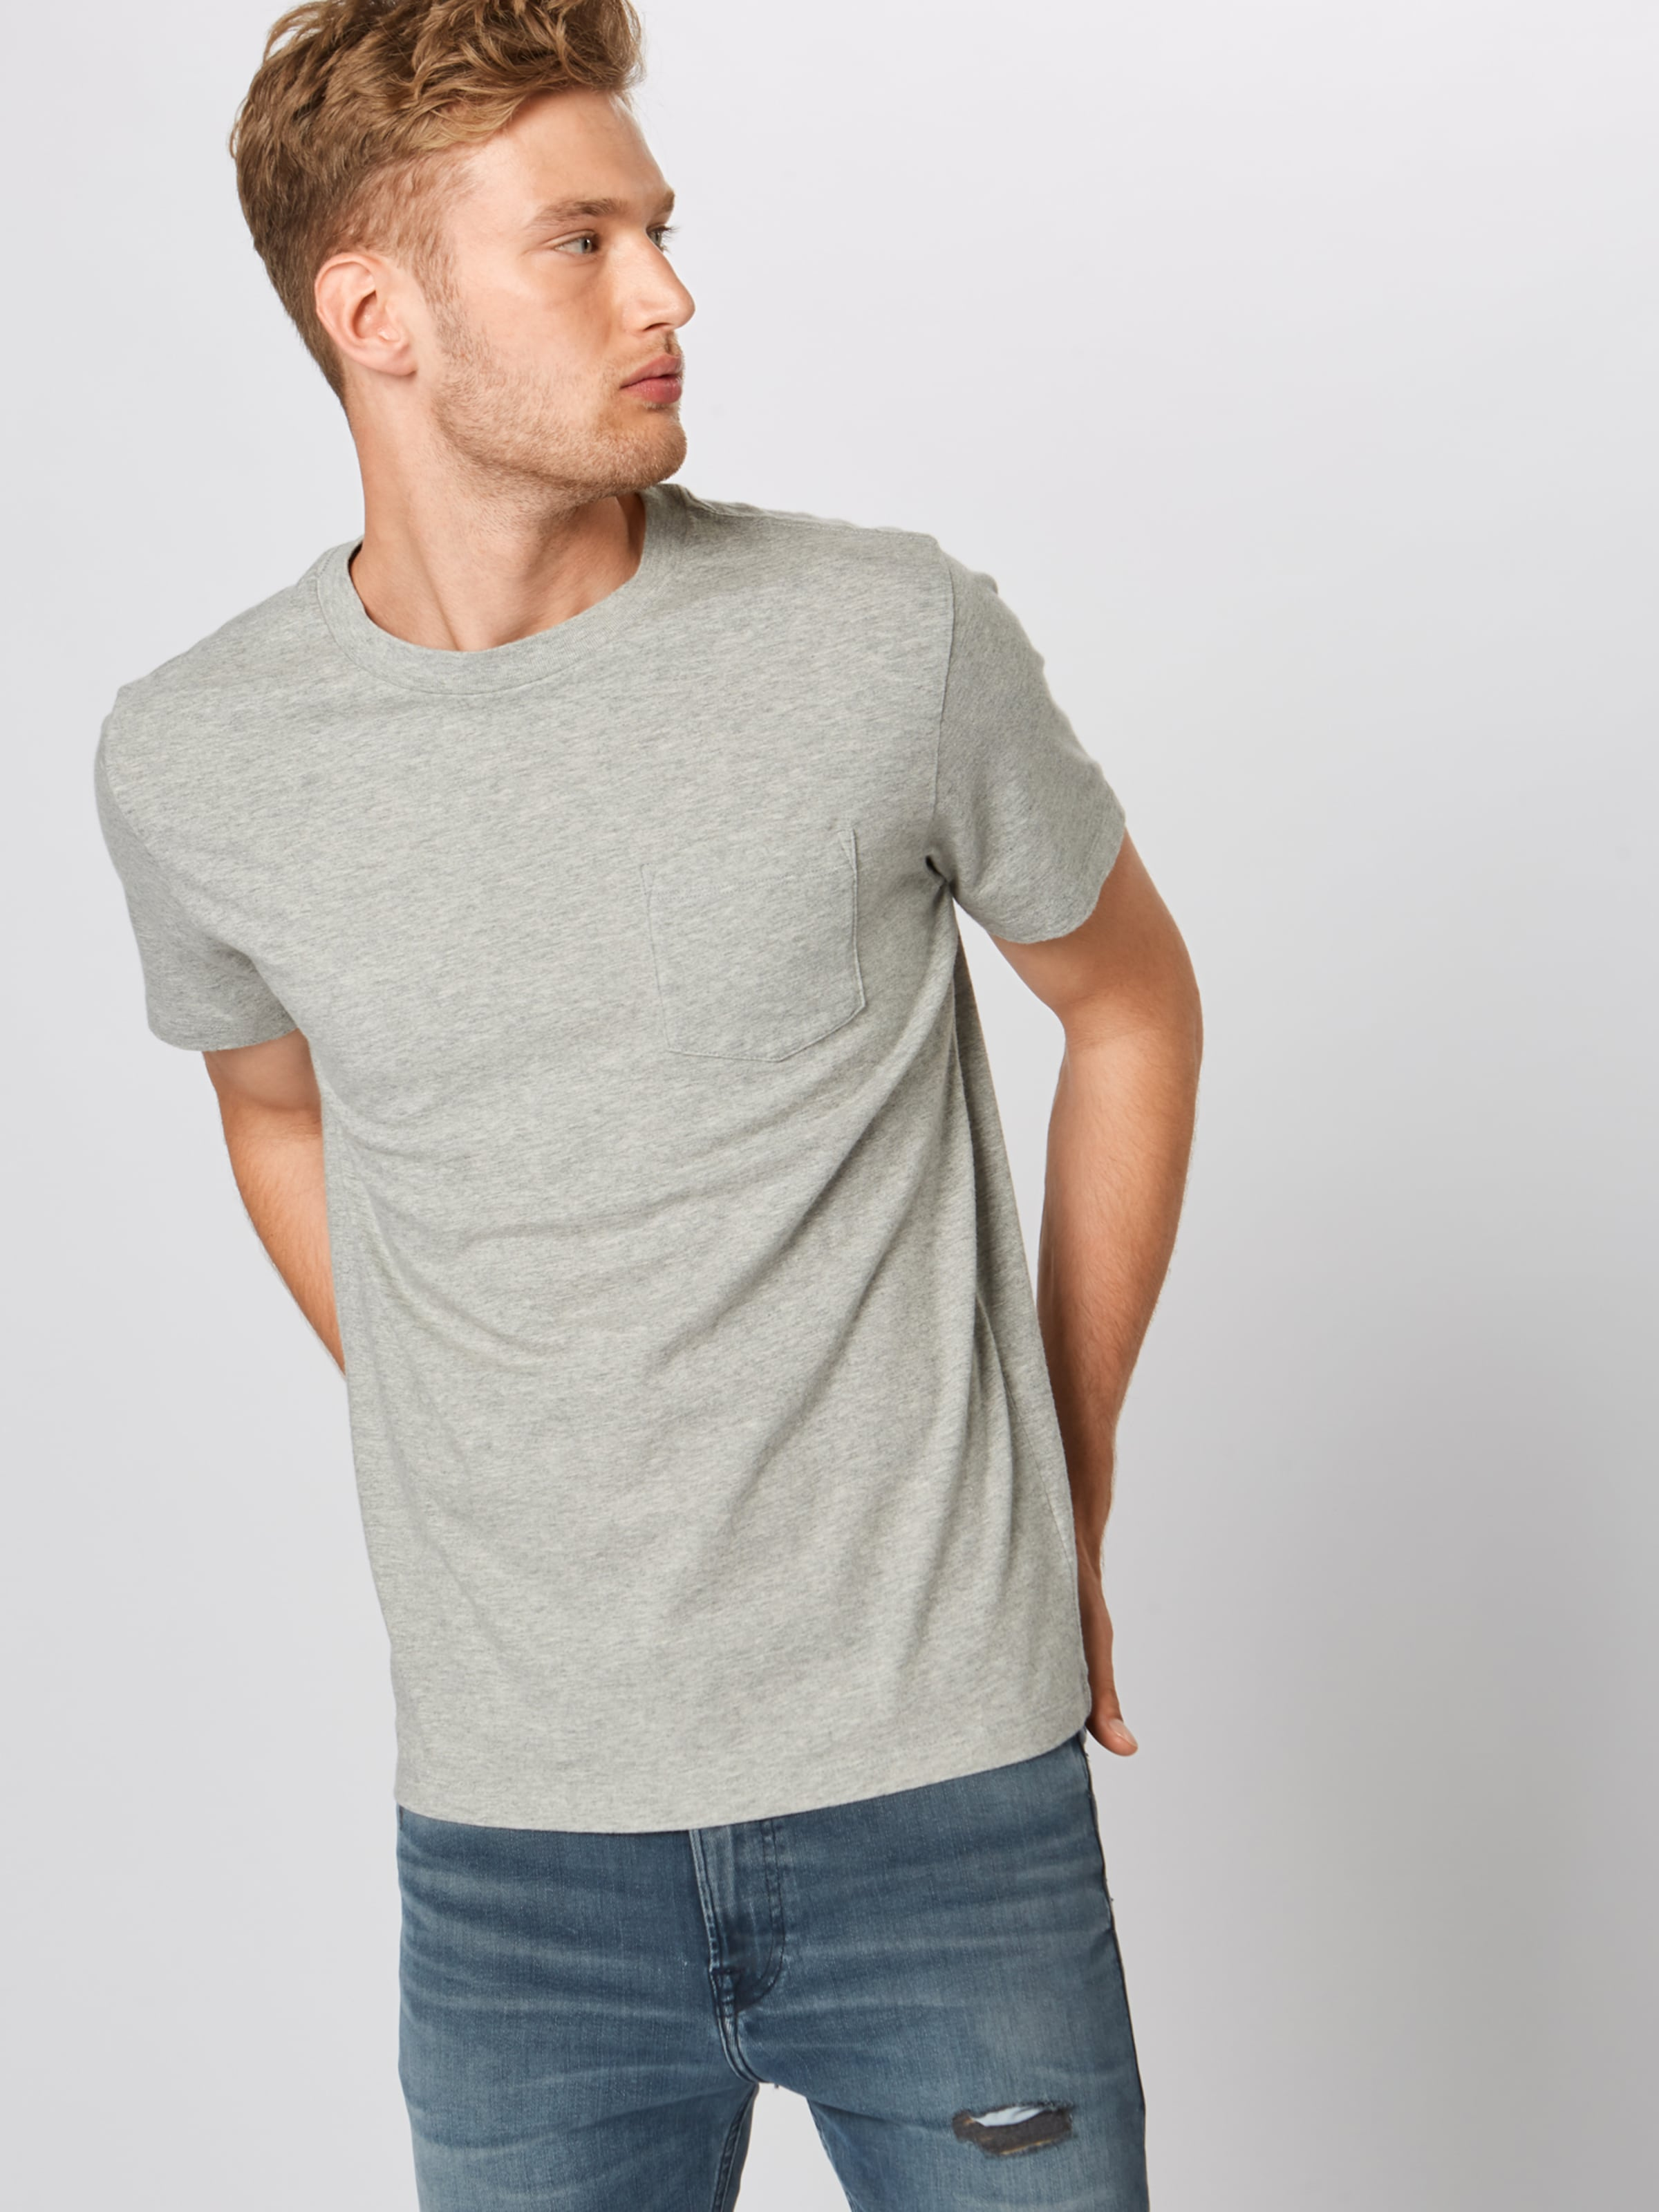 En shirt Gris Gap Gris T En Gap shirt T N8mnw0